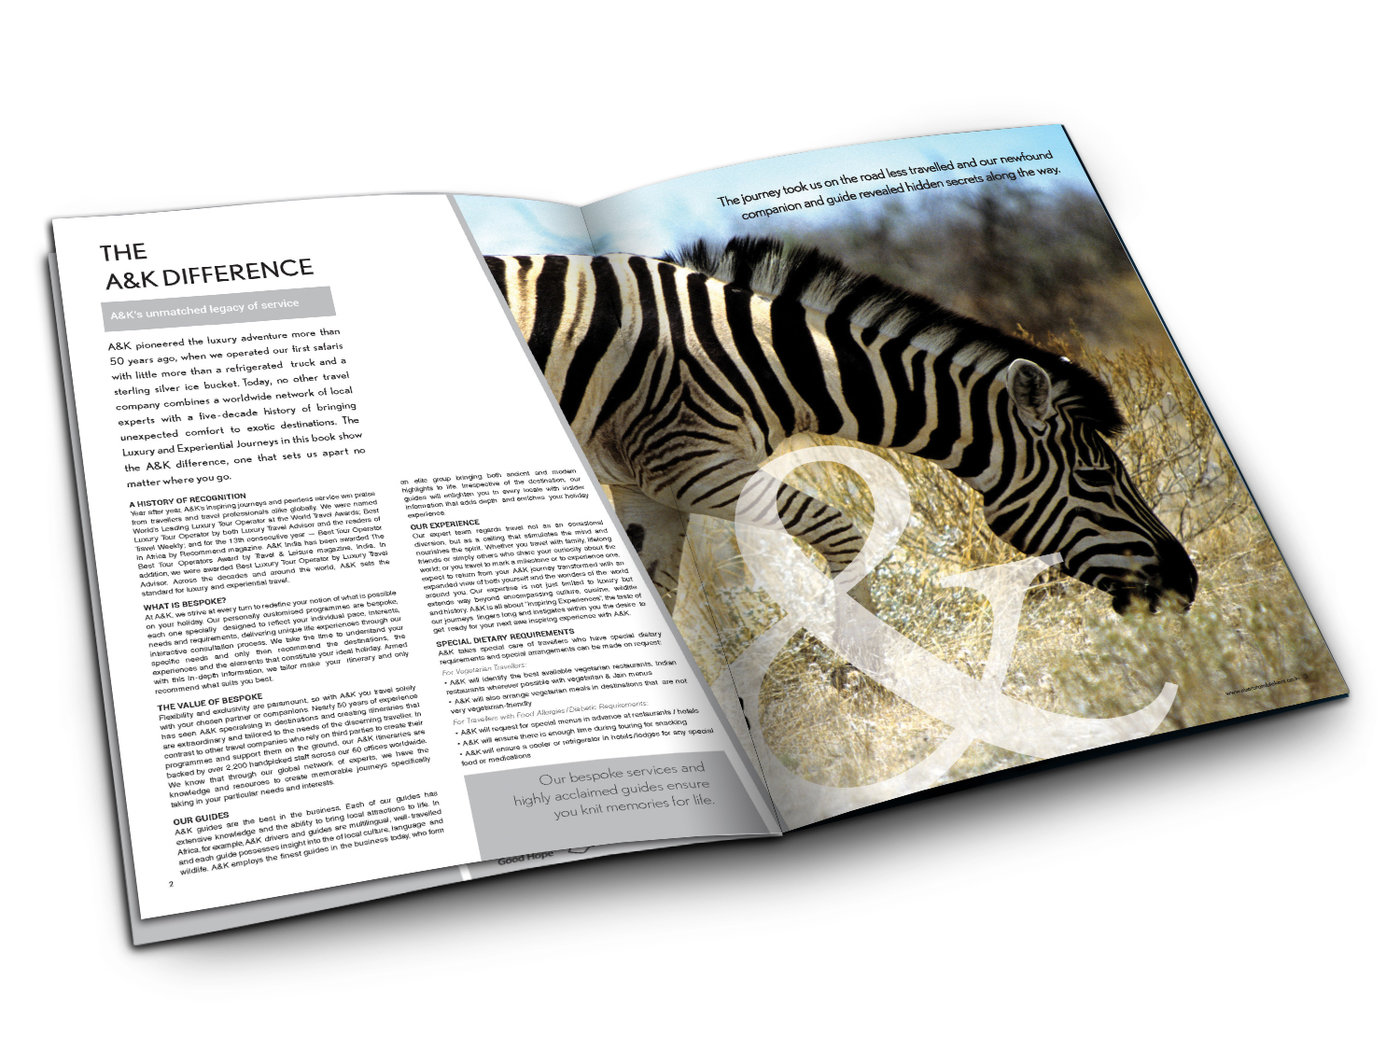 Abercrombie & Kent - Brochure Design by Sandeep Shukla at Coroflot com